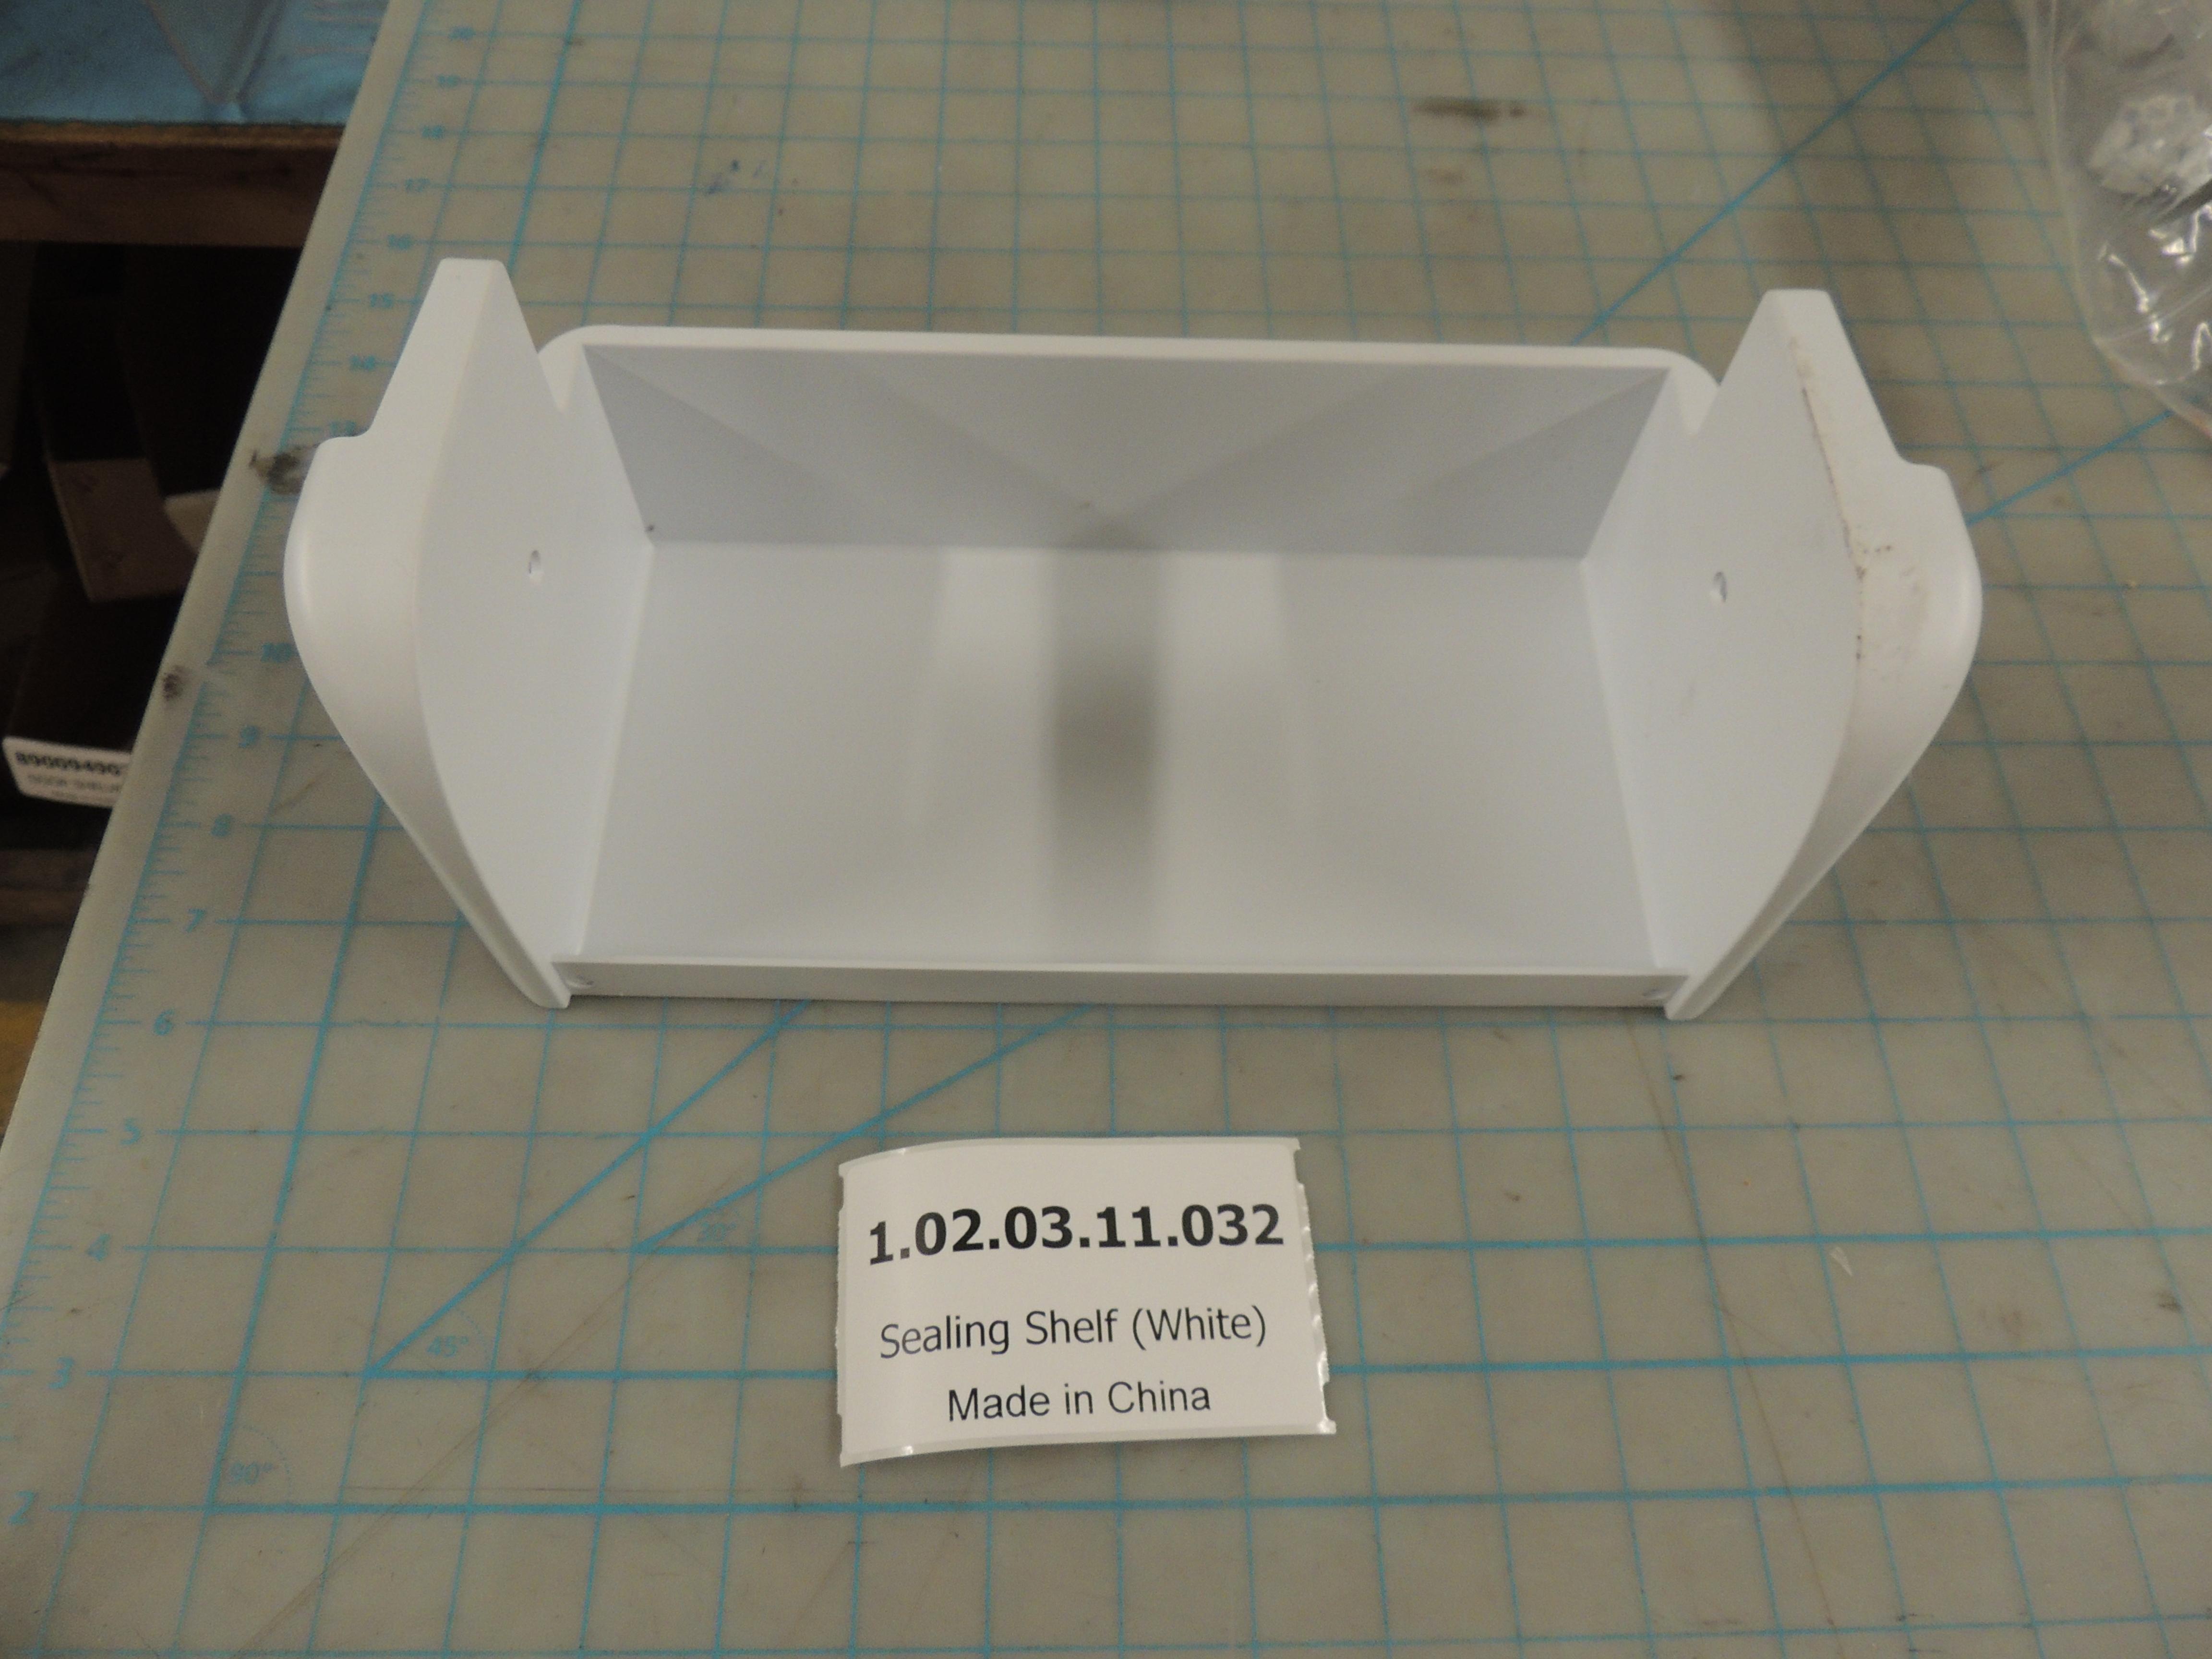 Sealing Shelf (White)